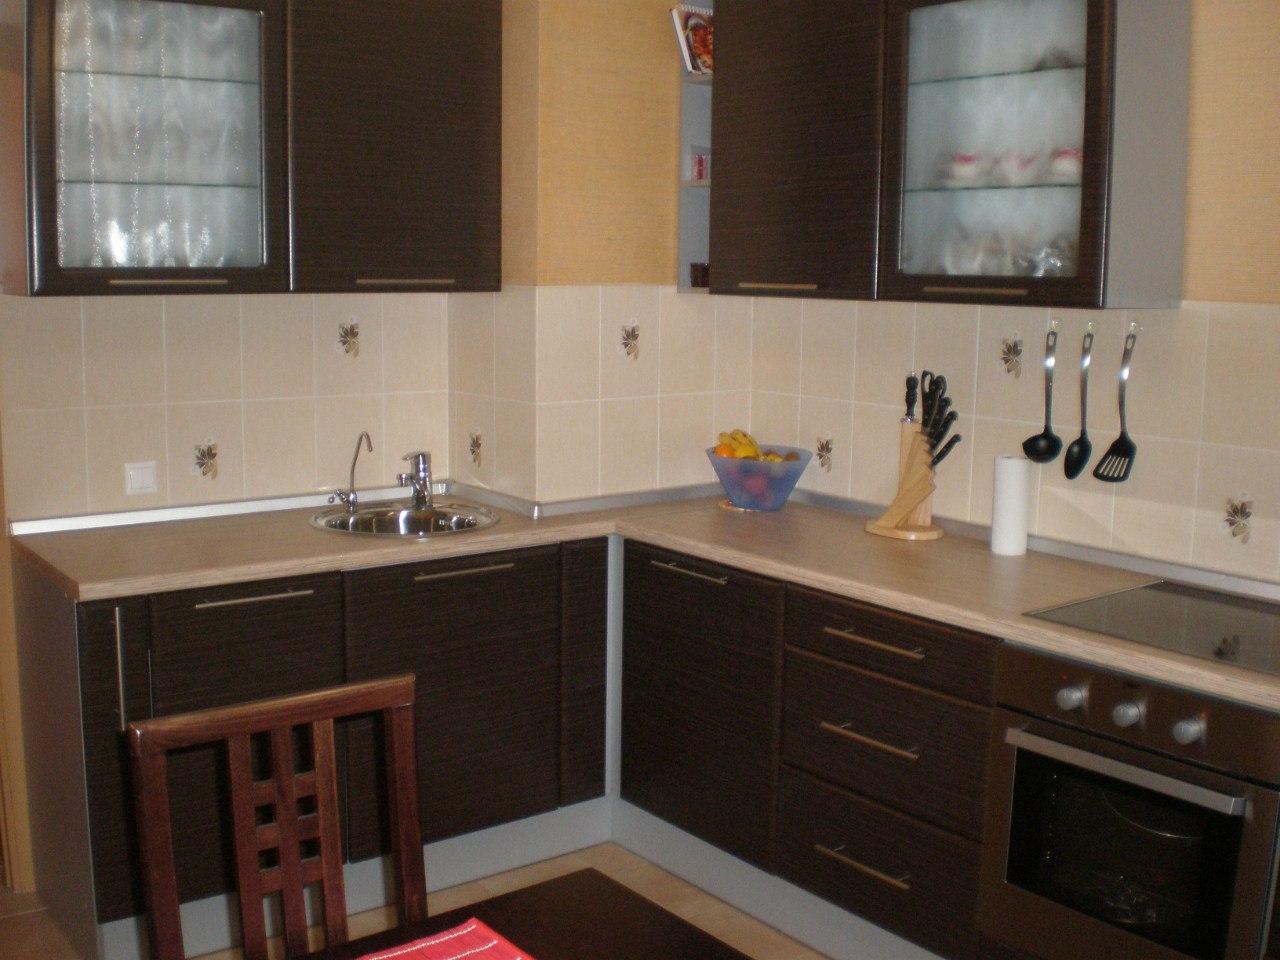 Кухни с вентиляционным коробом фото